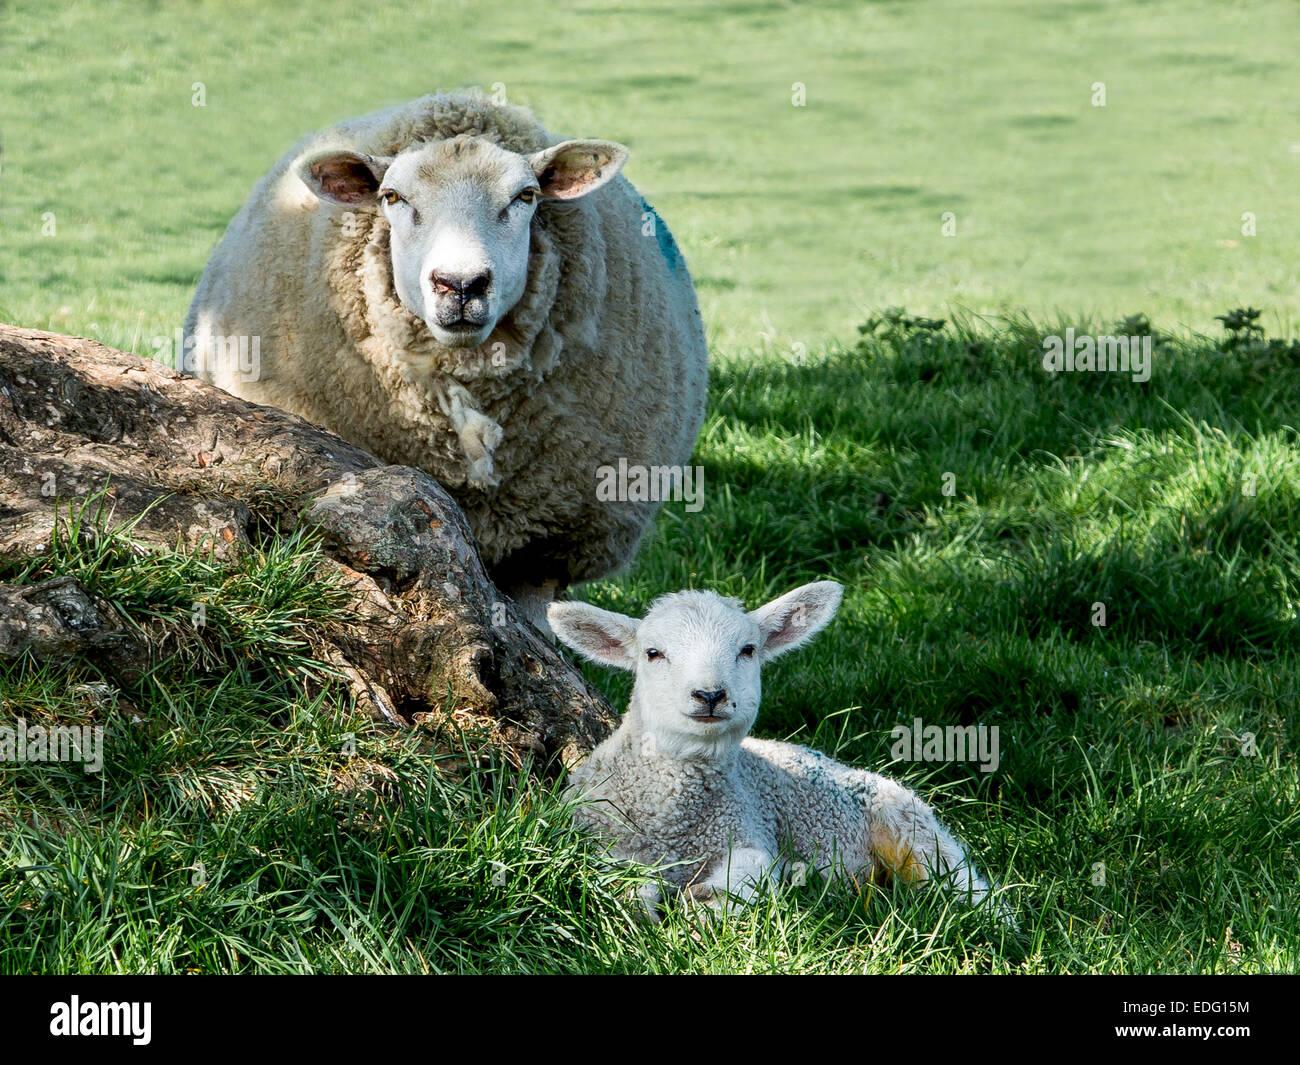 Yew and lamb - Stock Image